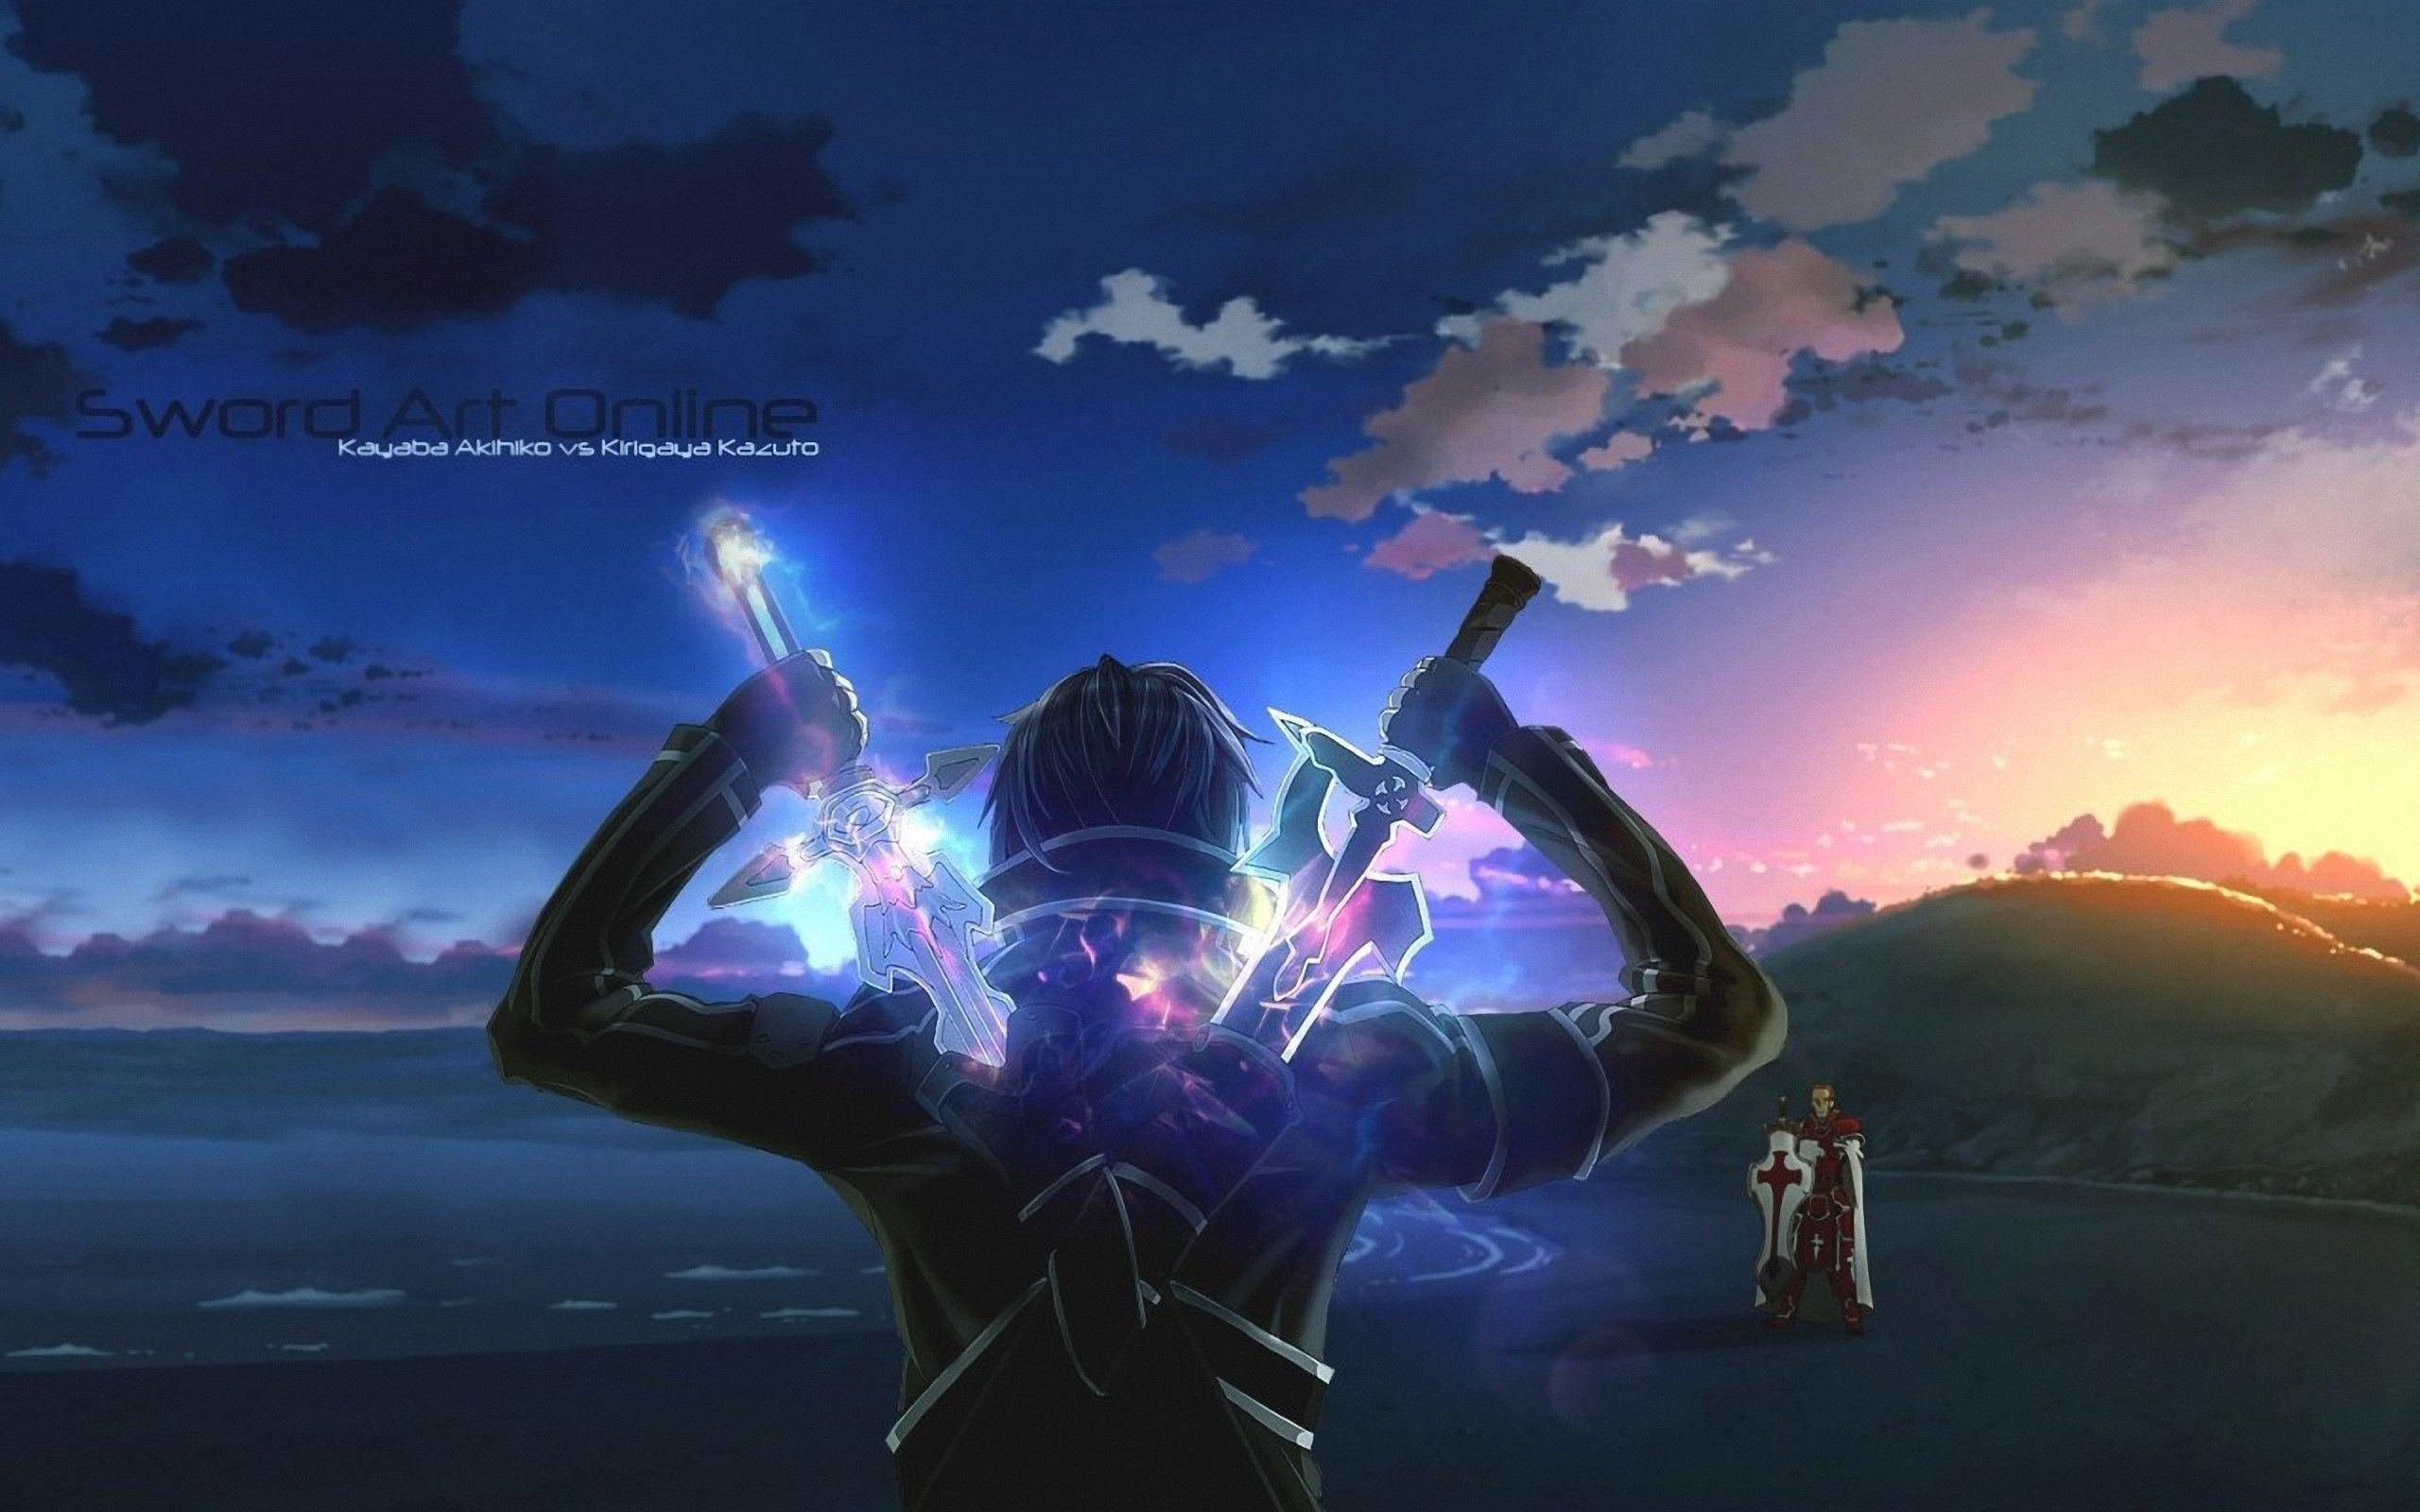 sword art online anime swords upscaled warriors wallpaper (#3021993